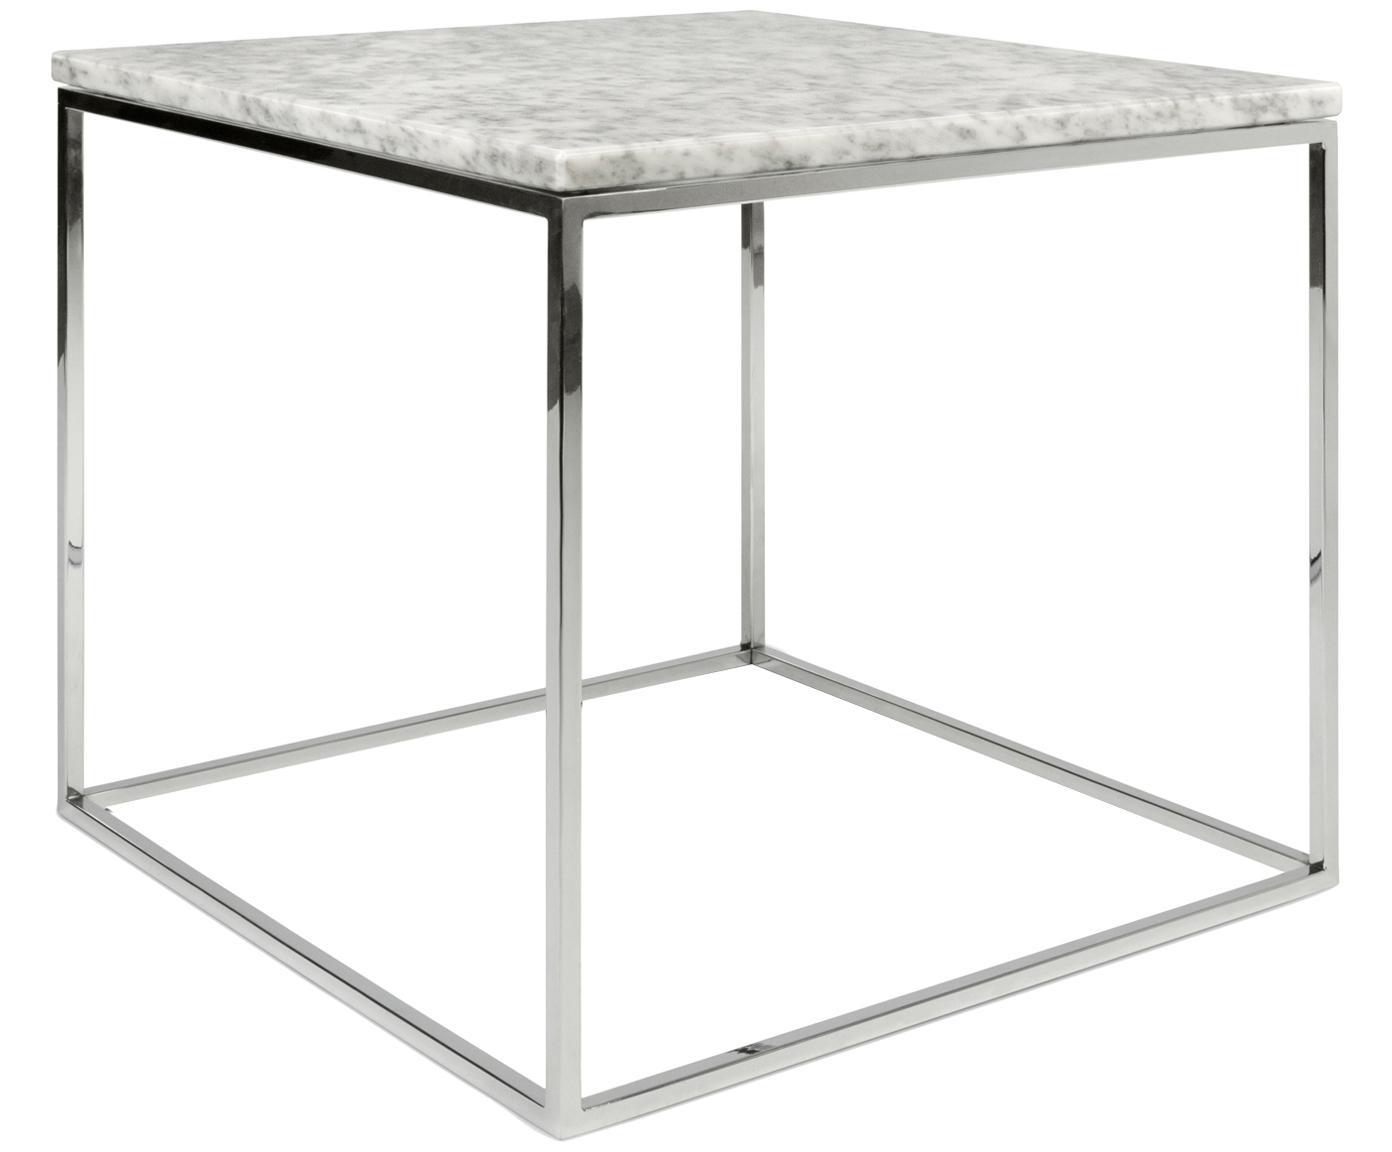 Marmeren bijzettafel Gleam, Tafelblad: marmer, Frame: verchroomd staal, Tafelblad: gemarmerd wit. Frame: chroomkleurig, 50 x 45 cm